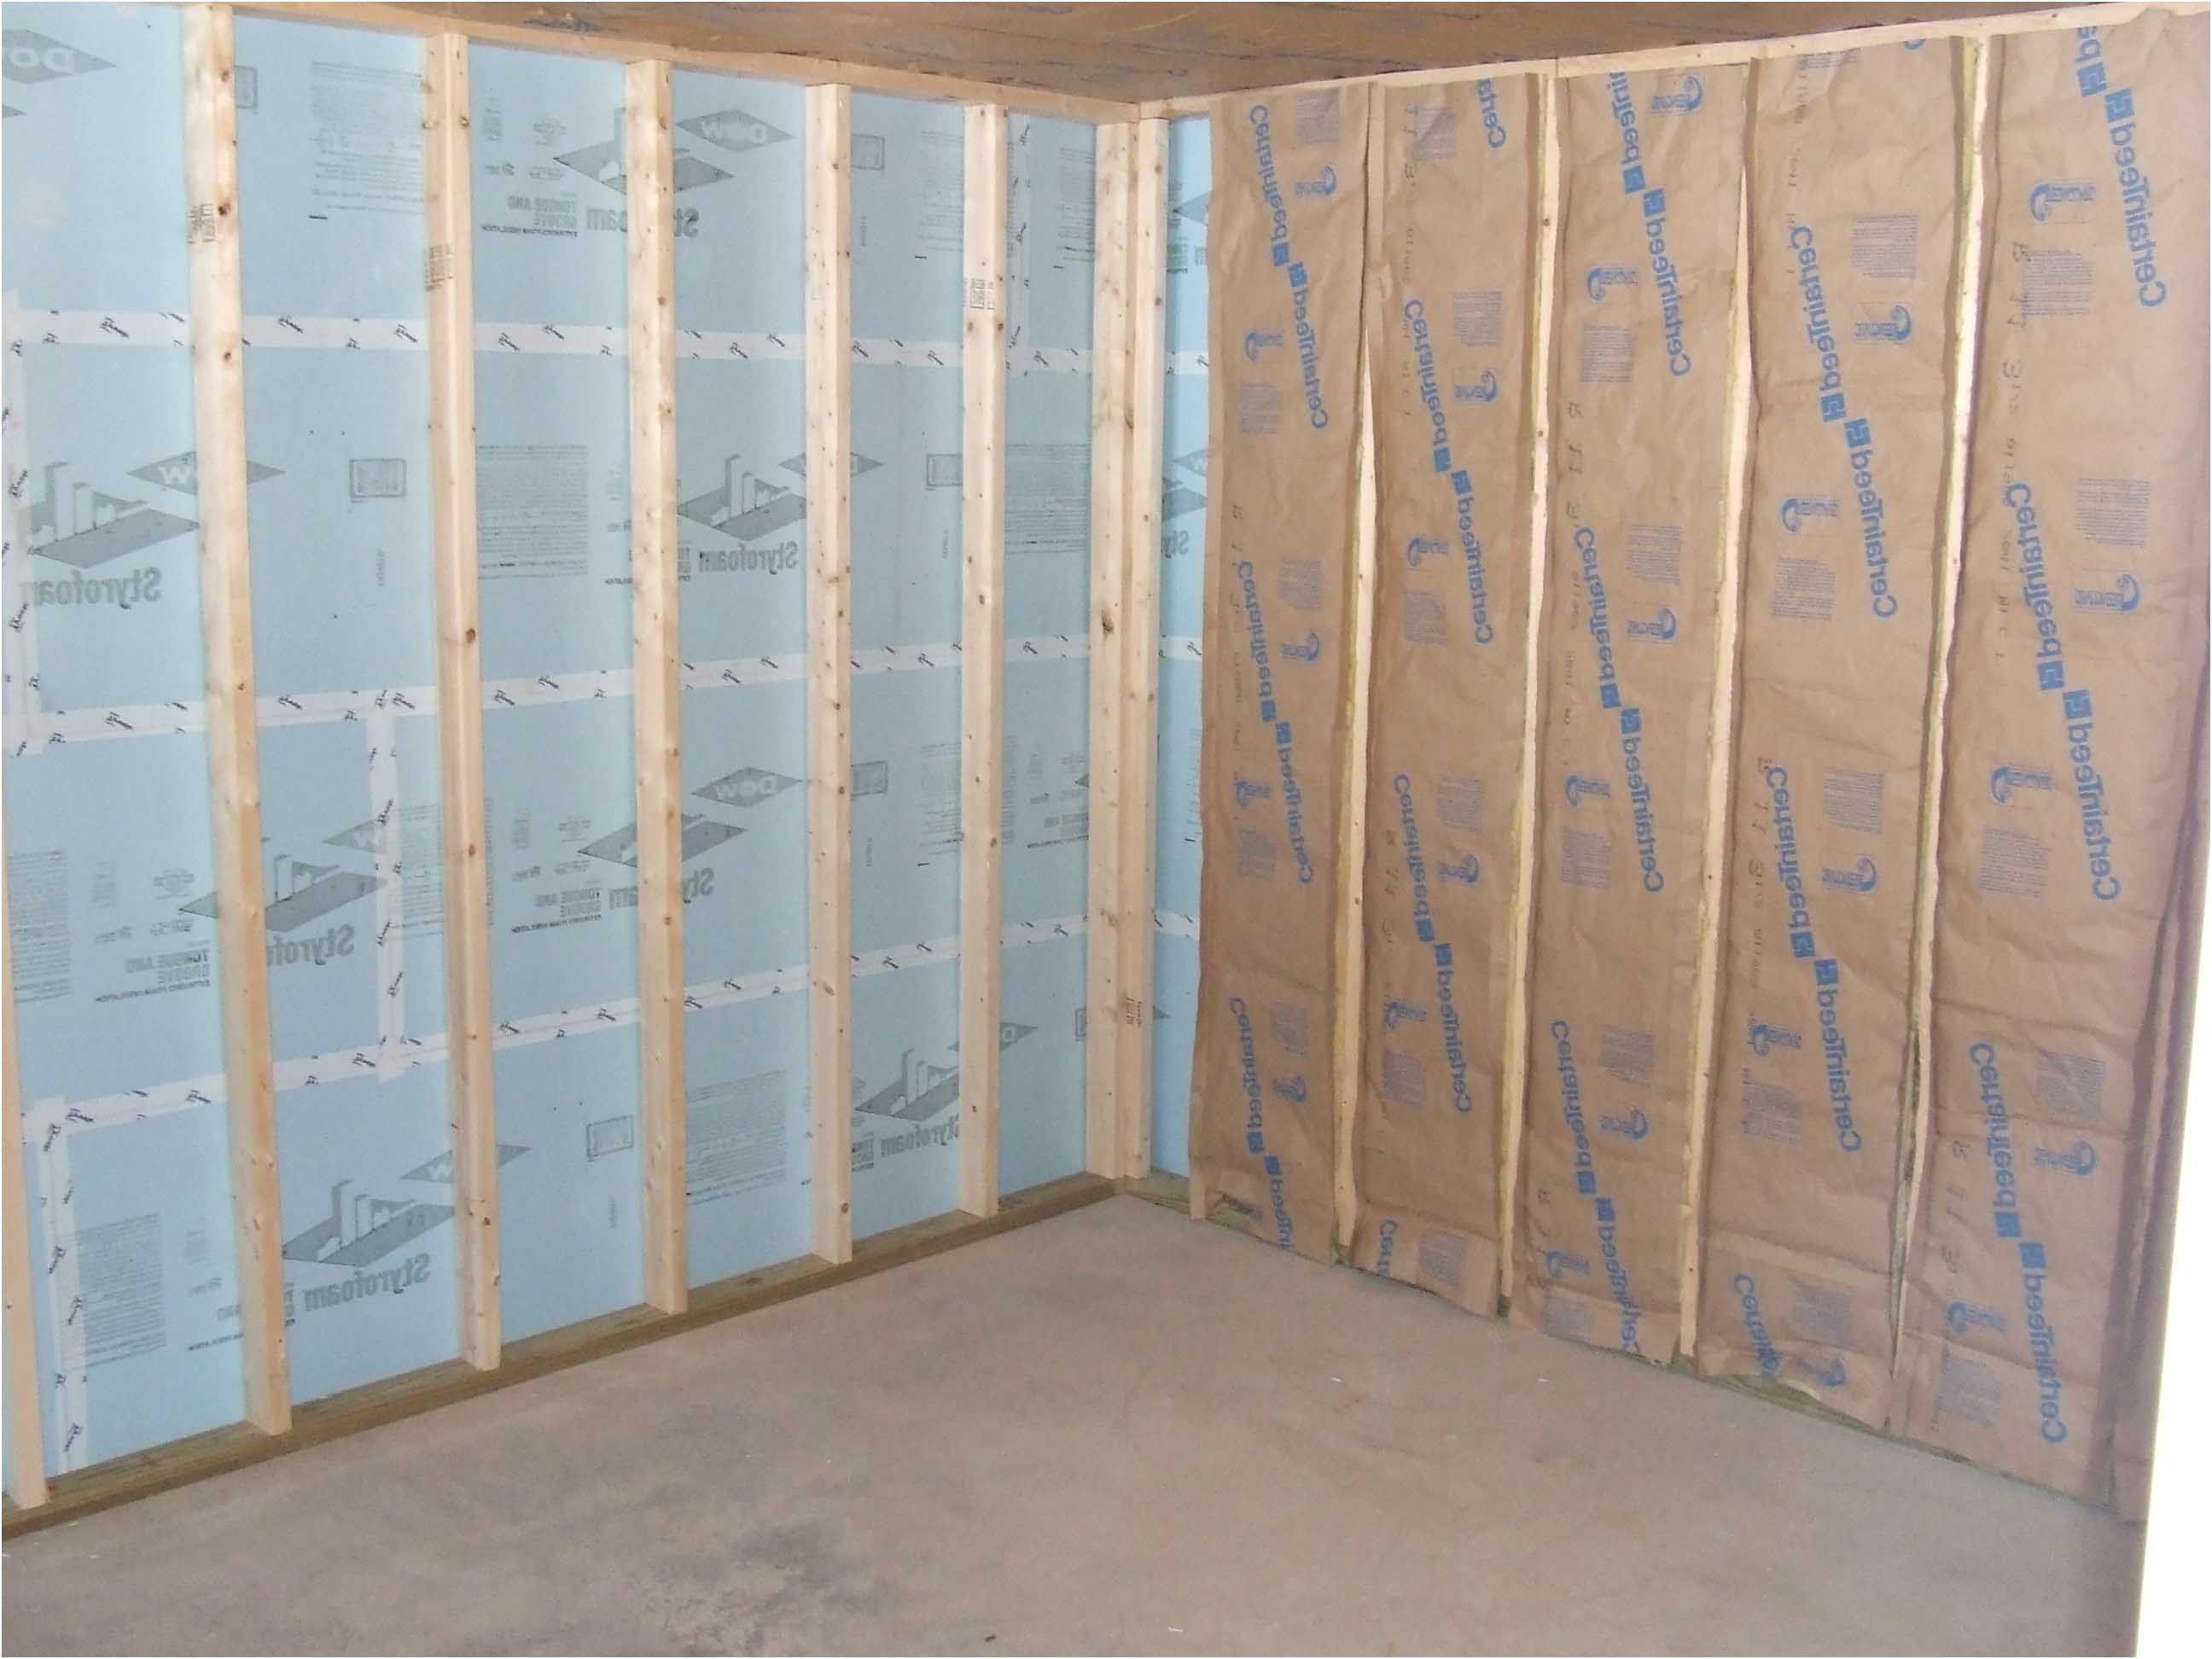 Best Methods For Insulating Basement Walls From Basement